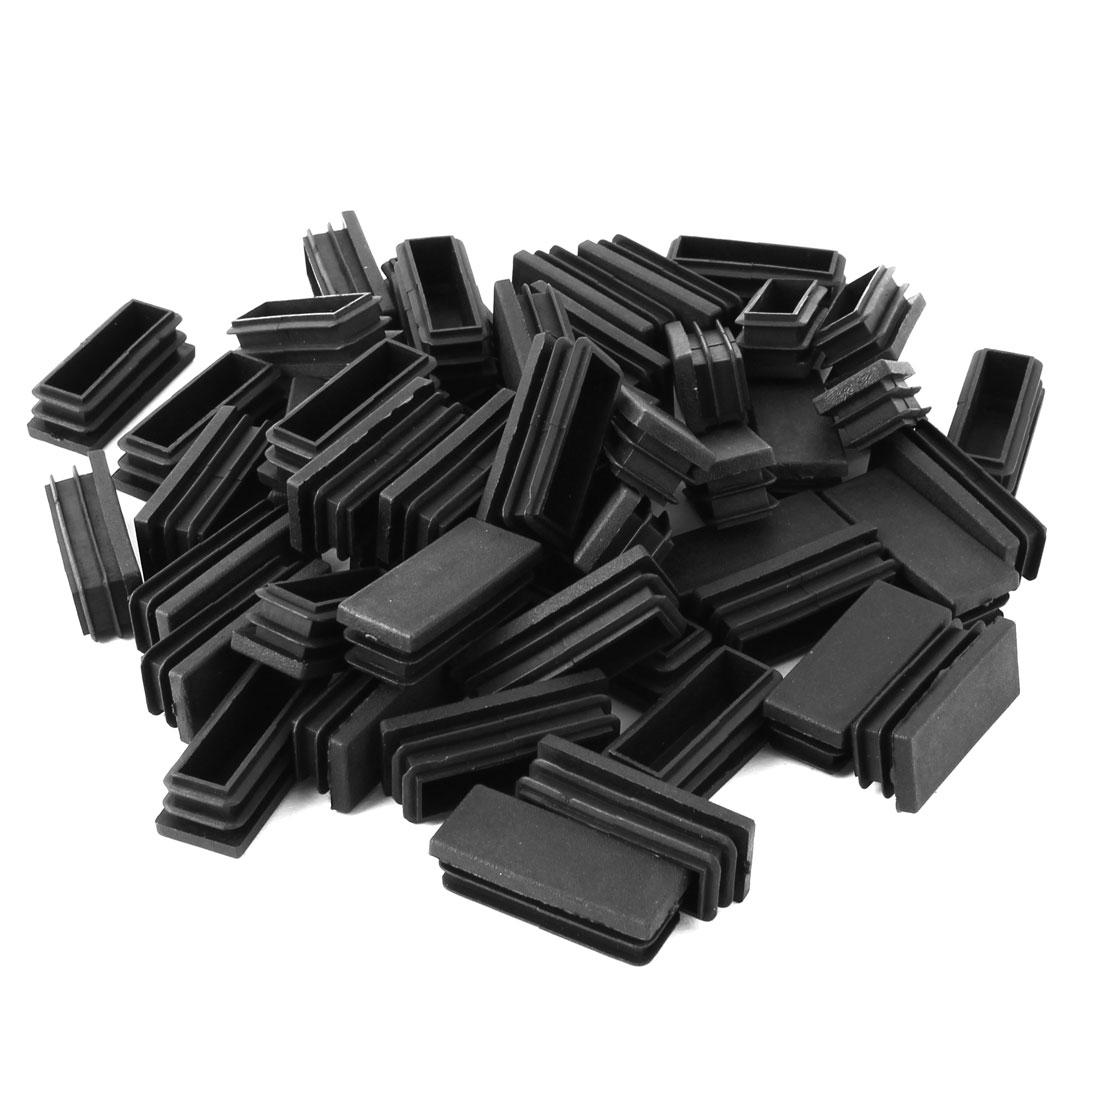 Home Office Plastic Rectangle Shaped Table Legs Tube Insert Black 50 x 20mm 50 Pcs